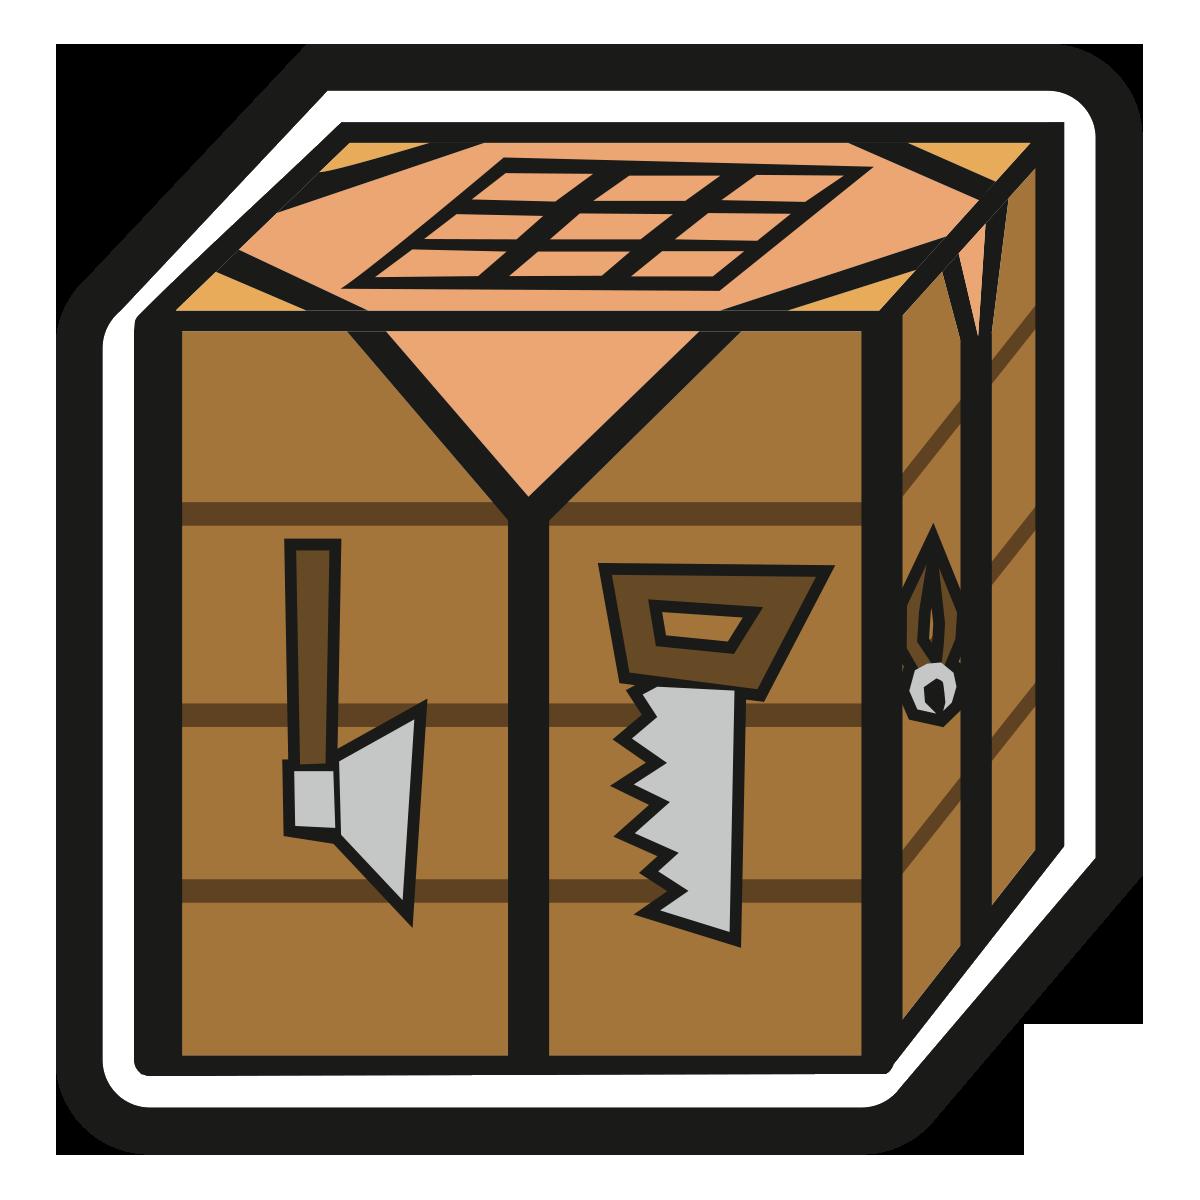 Minecraft clipart mining tool, Minecraft mining tool Transparent